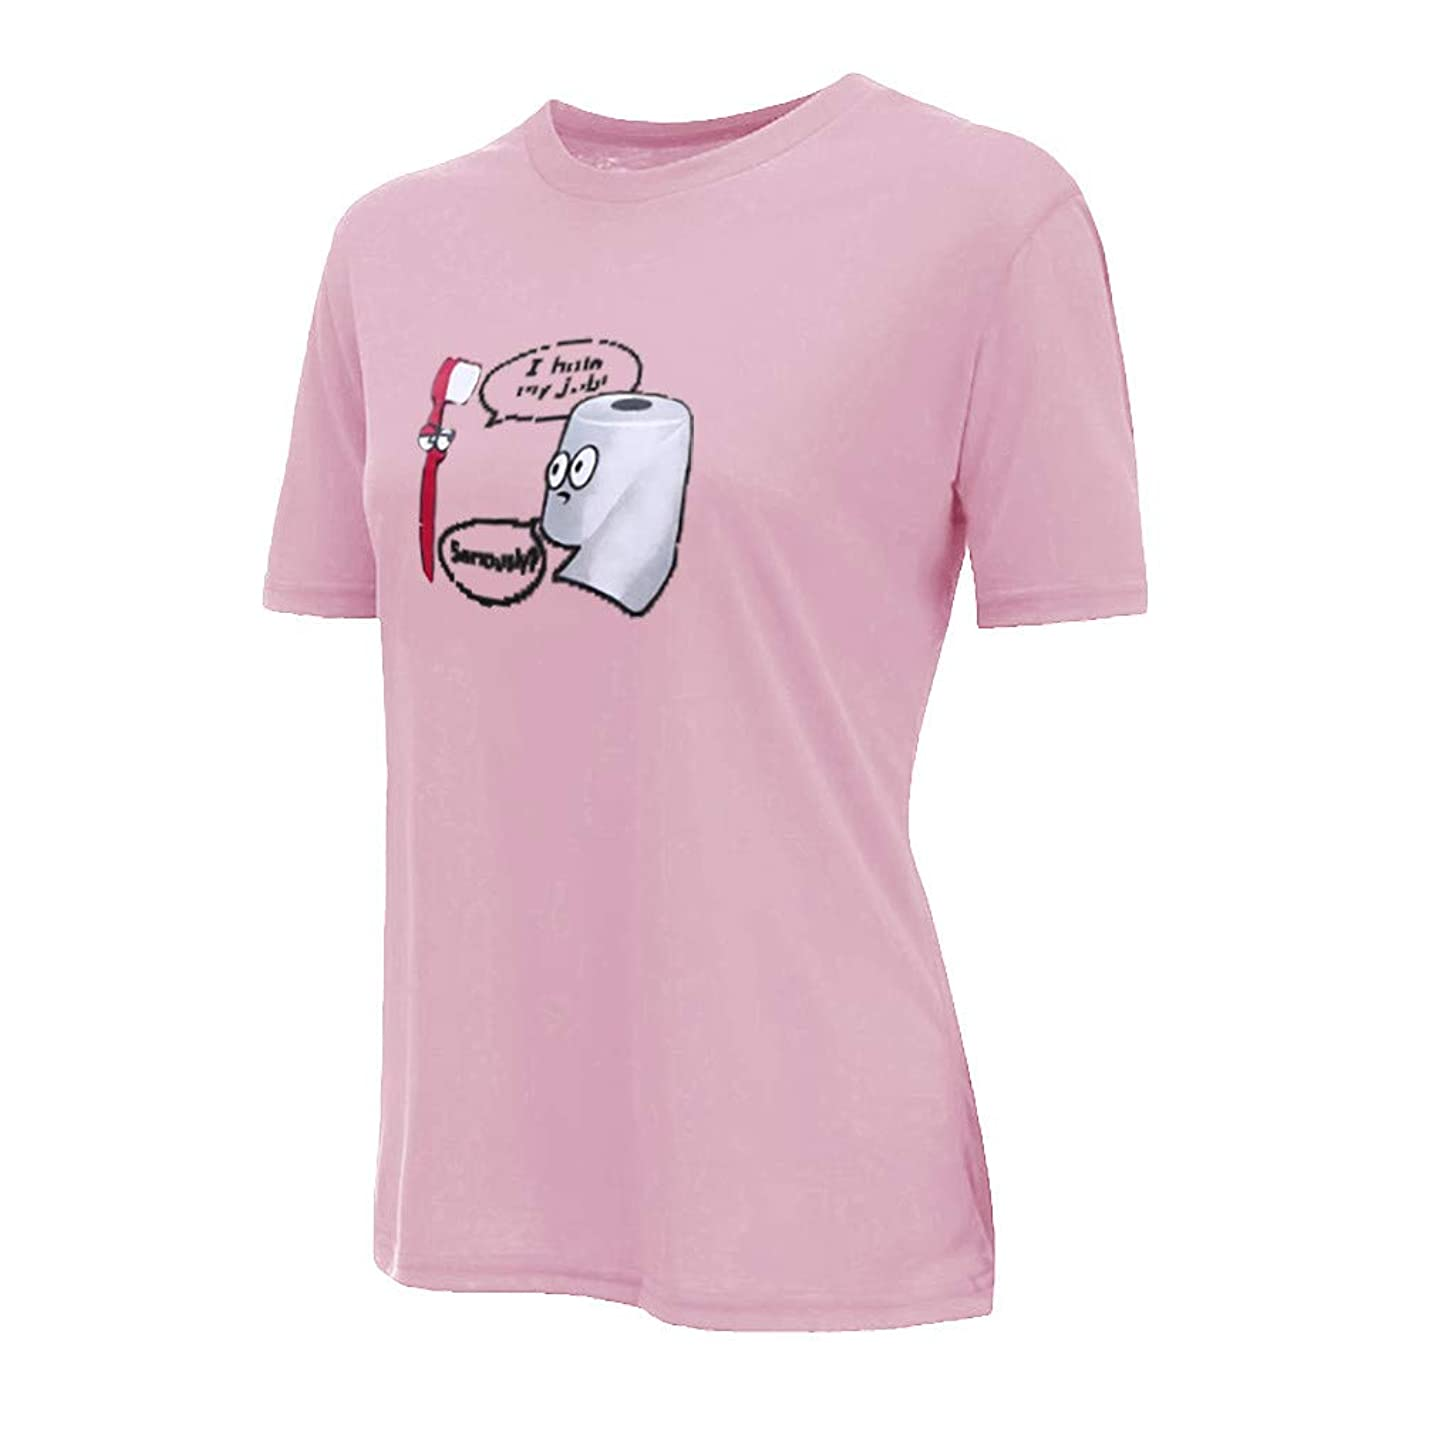 HimTak Women's o-Neck Letter t-Shirt i Hate My Job New Joker Cartoon Print Short Sleeve Loose Comfort Top